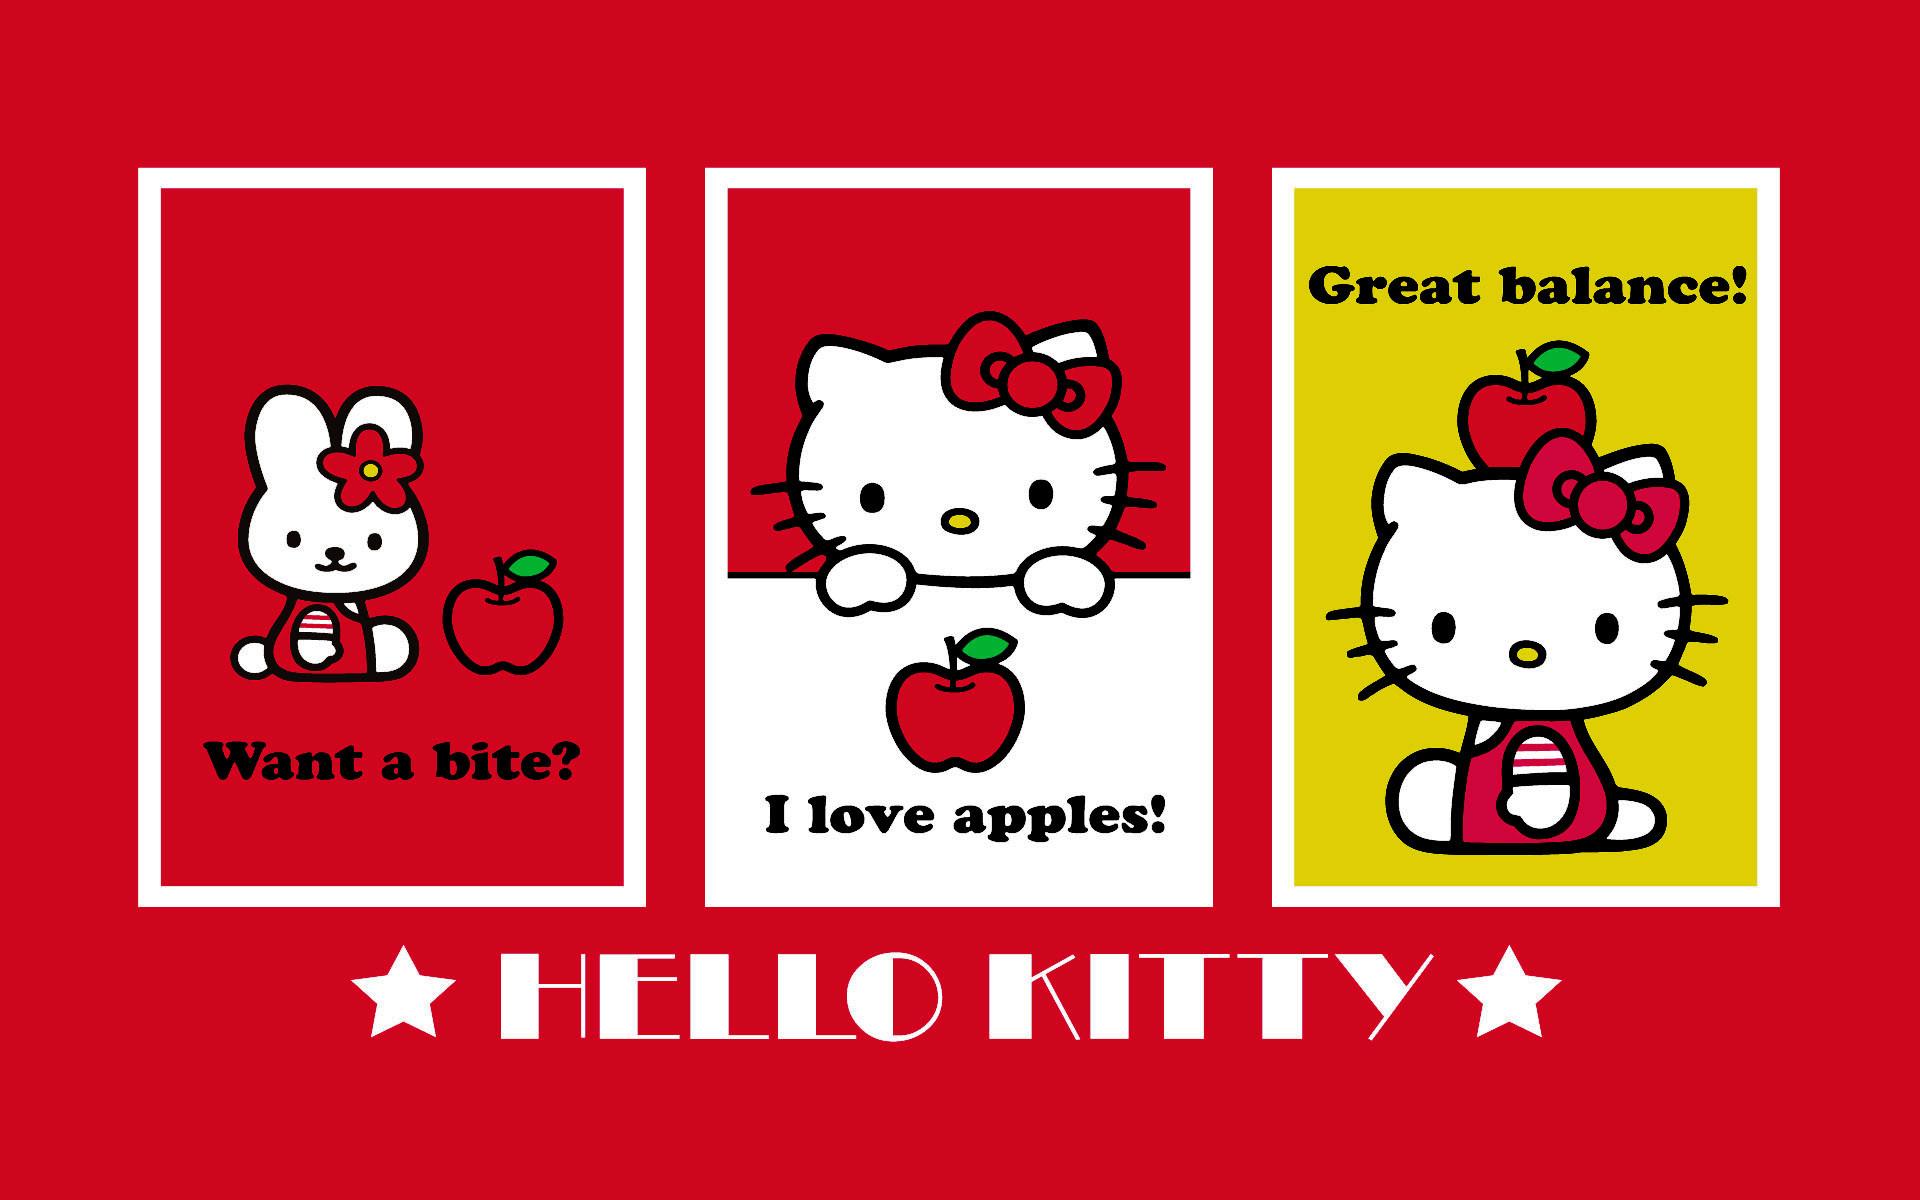 Good Wallpaper Hello Kitty Panda - 815957-full-size-wallpaper-hello-kitty-gif-1920x1200-for-ipad  HD_198668.jpg